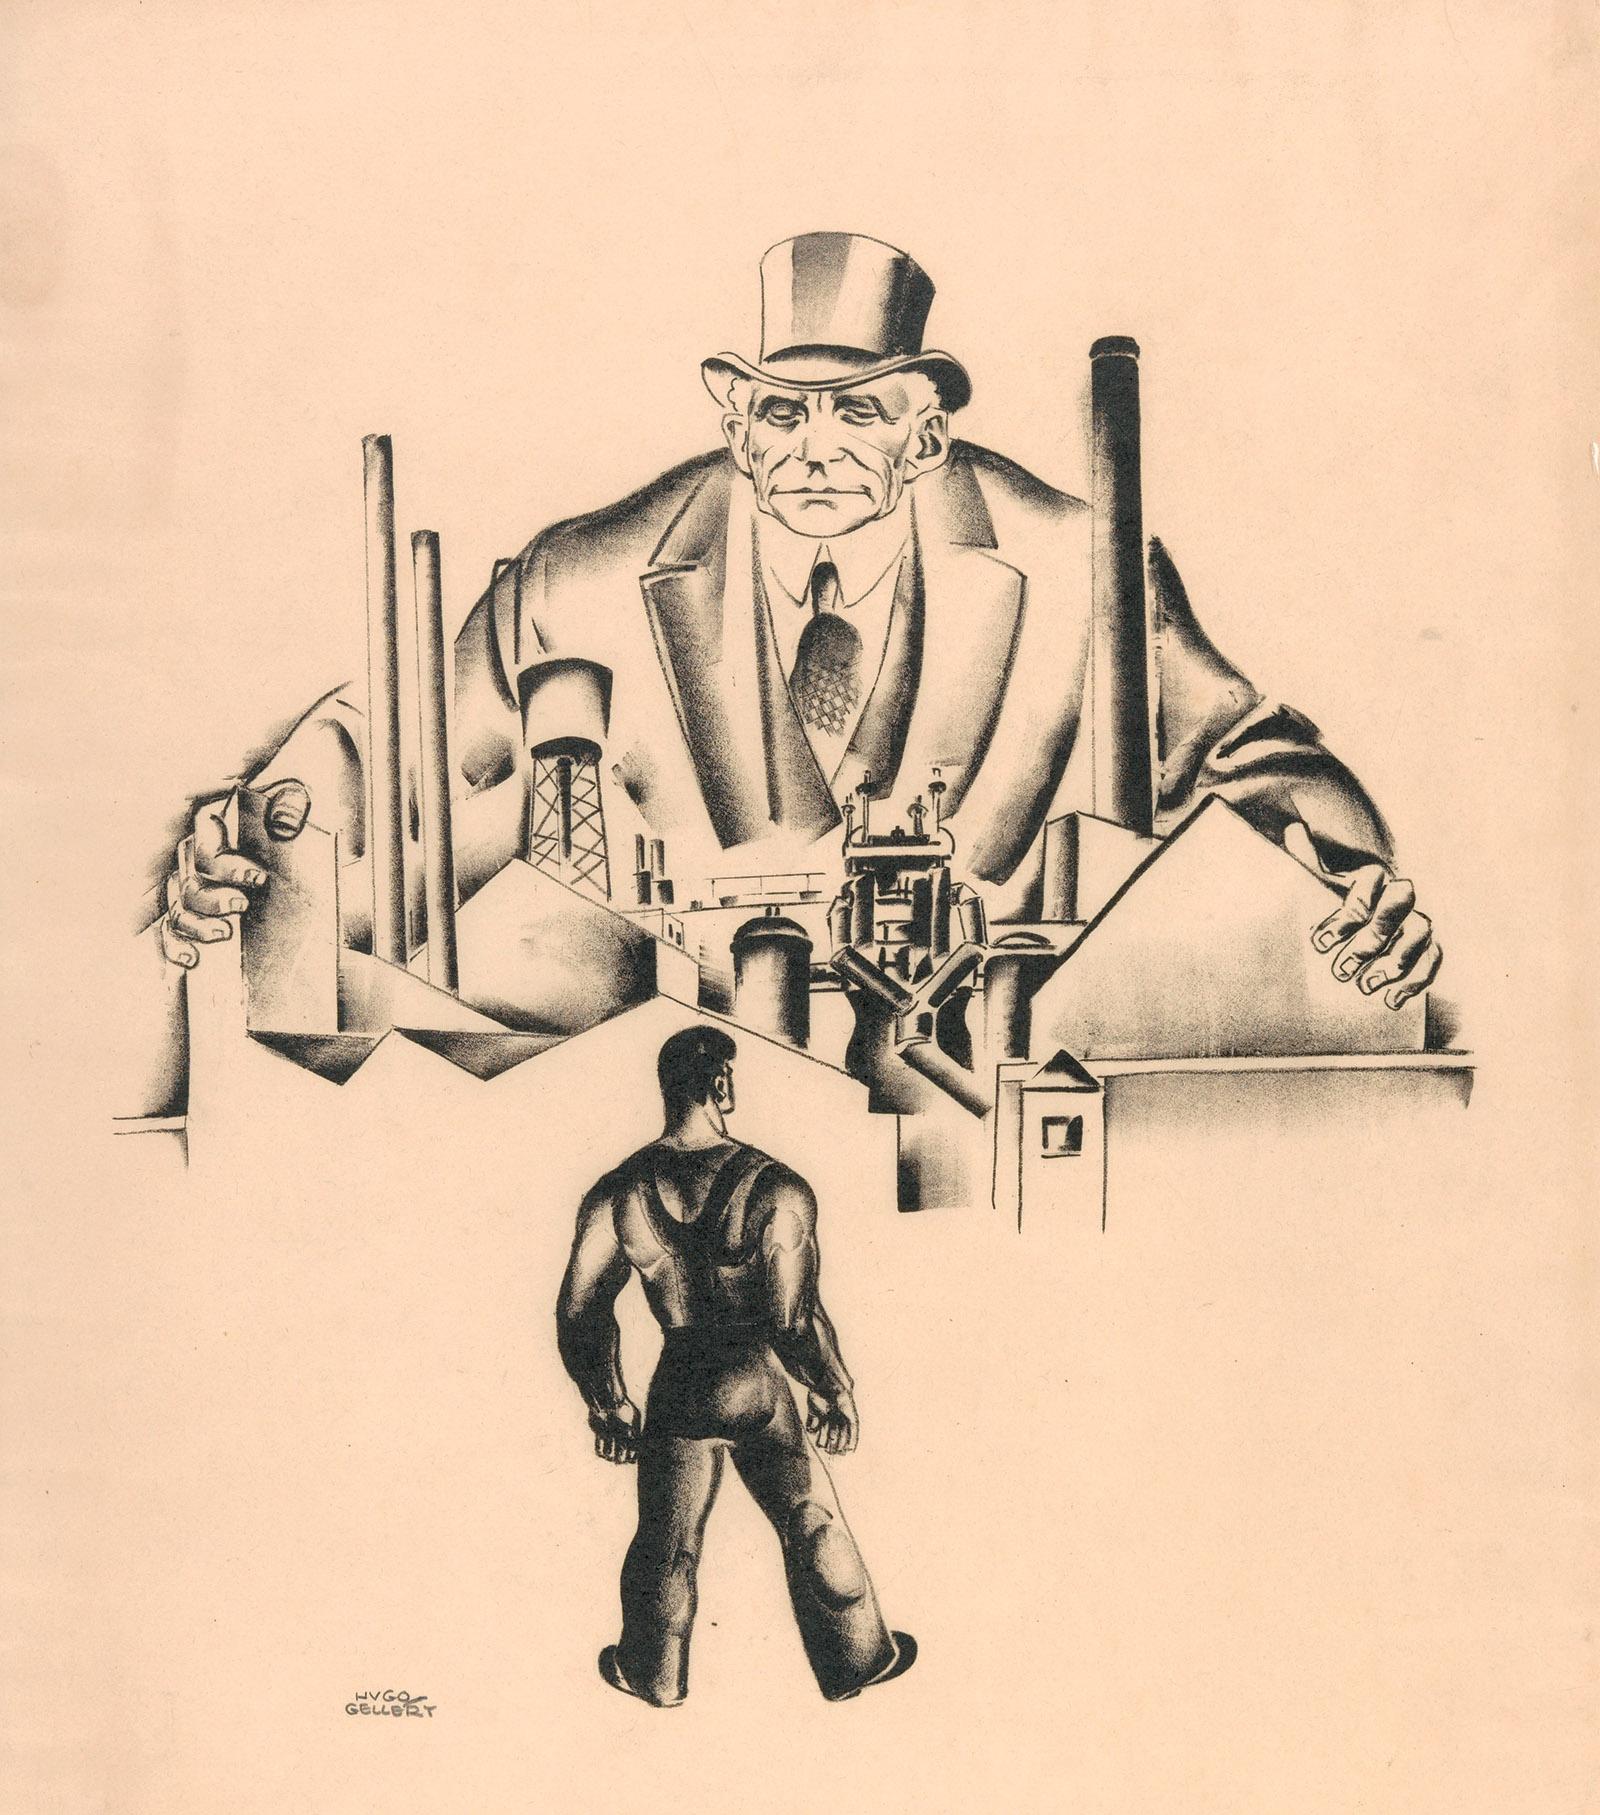 Primary Accumulation 3 (Henry Ford) by Hugo Gellert, 1933